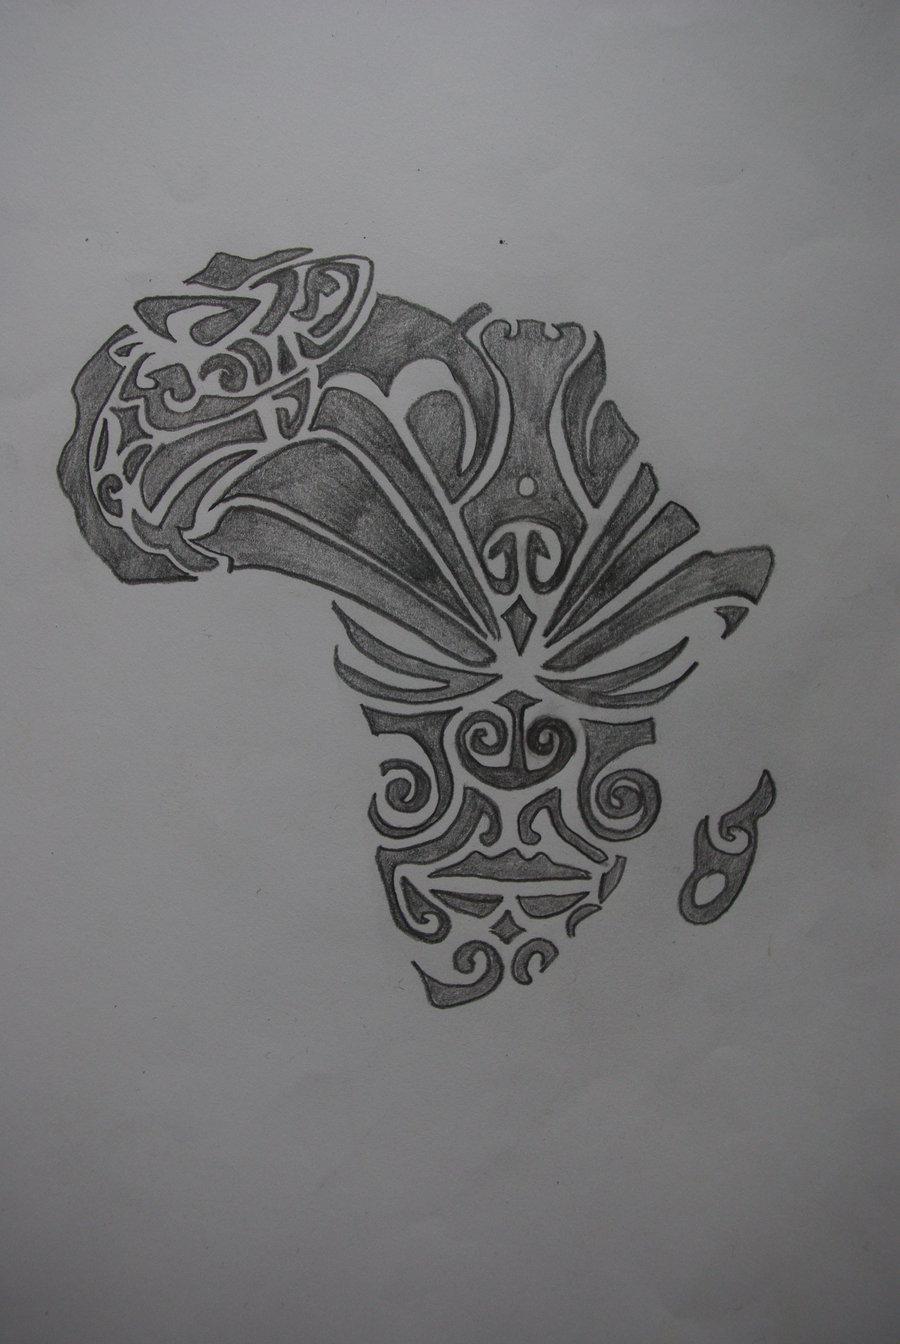 african tattoo images designs. Black Bedroom Furniture Sets. Home Design Ideas